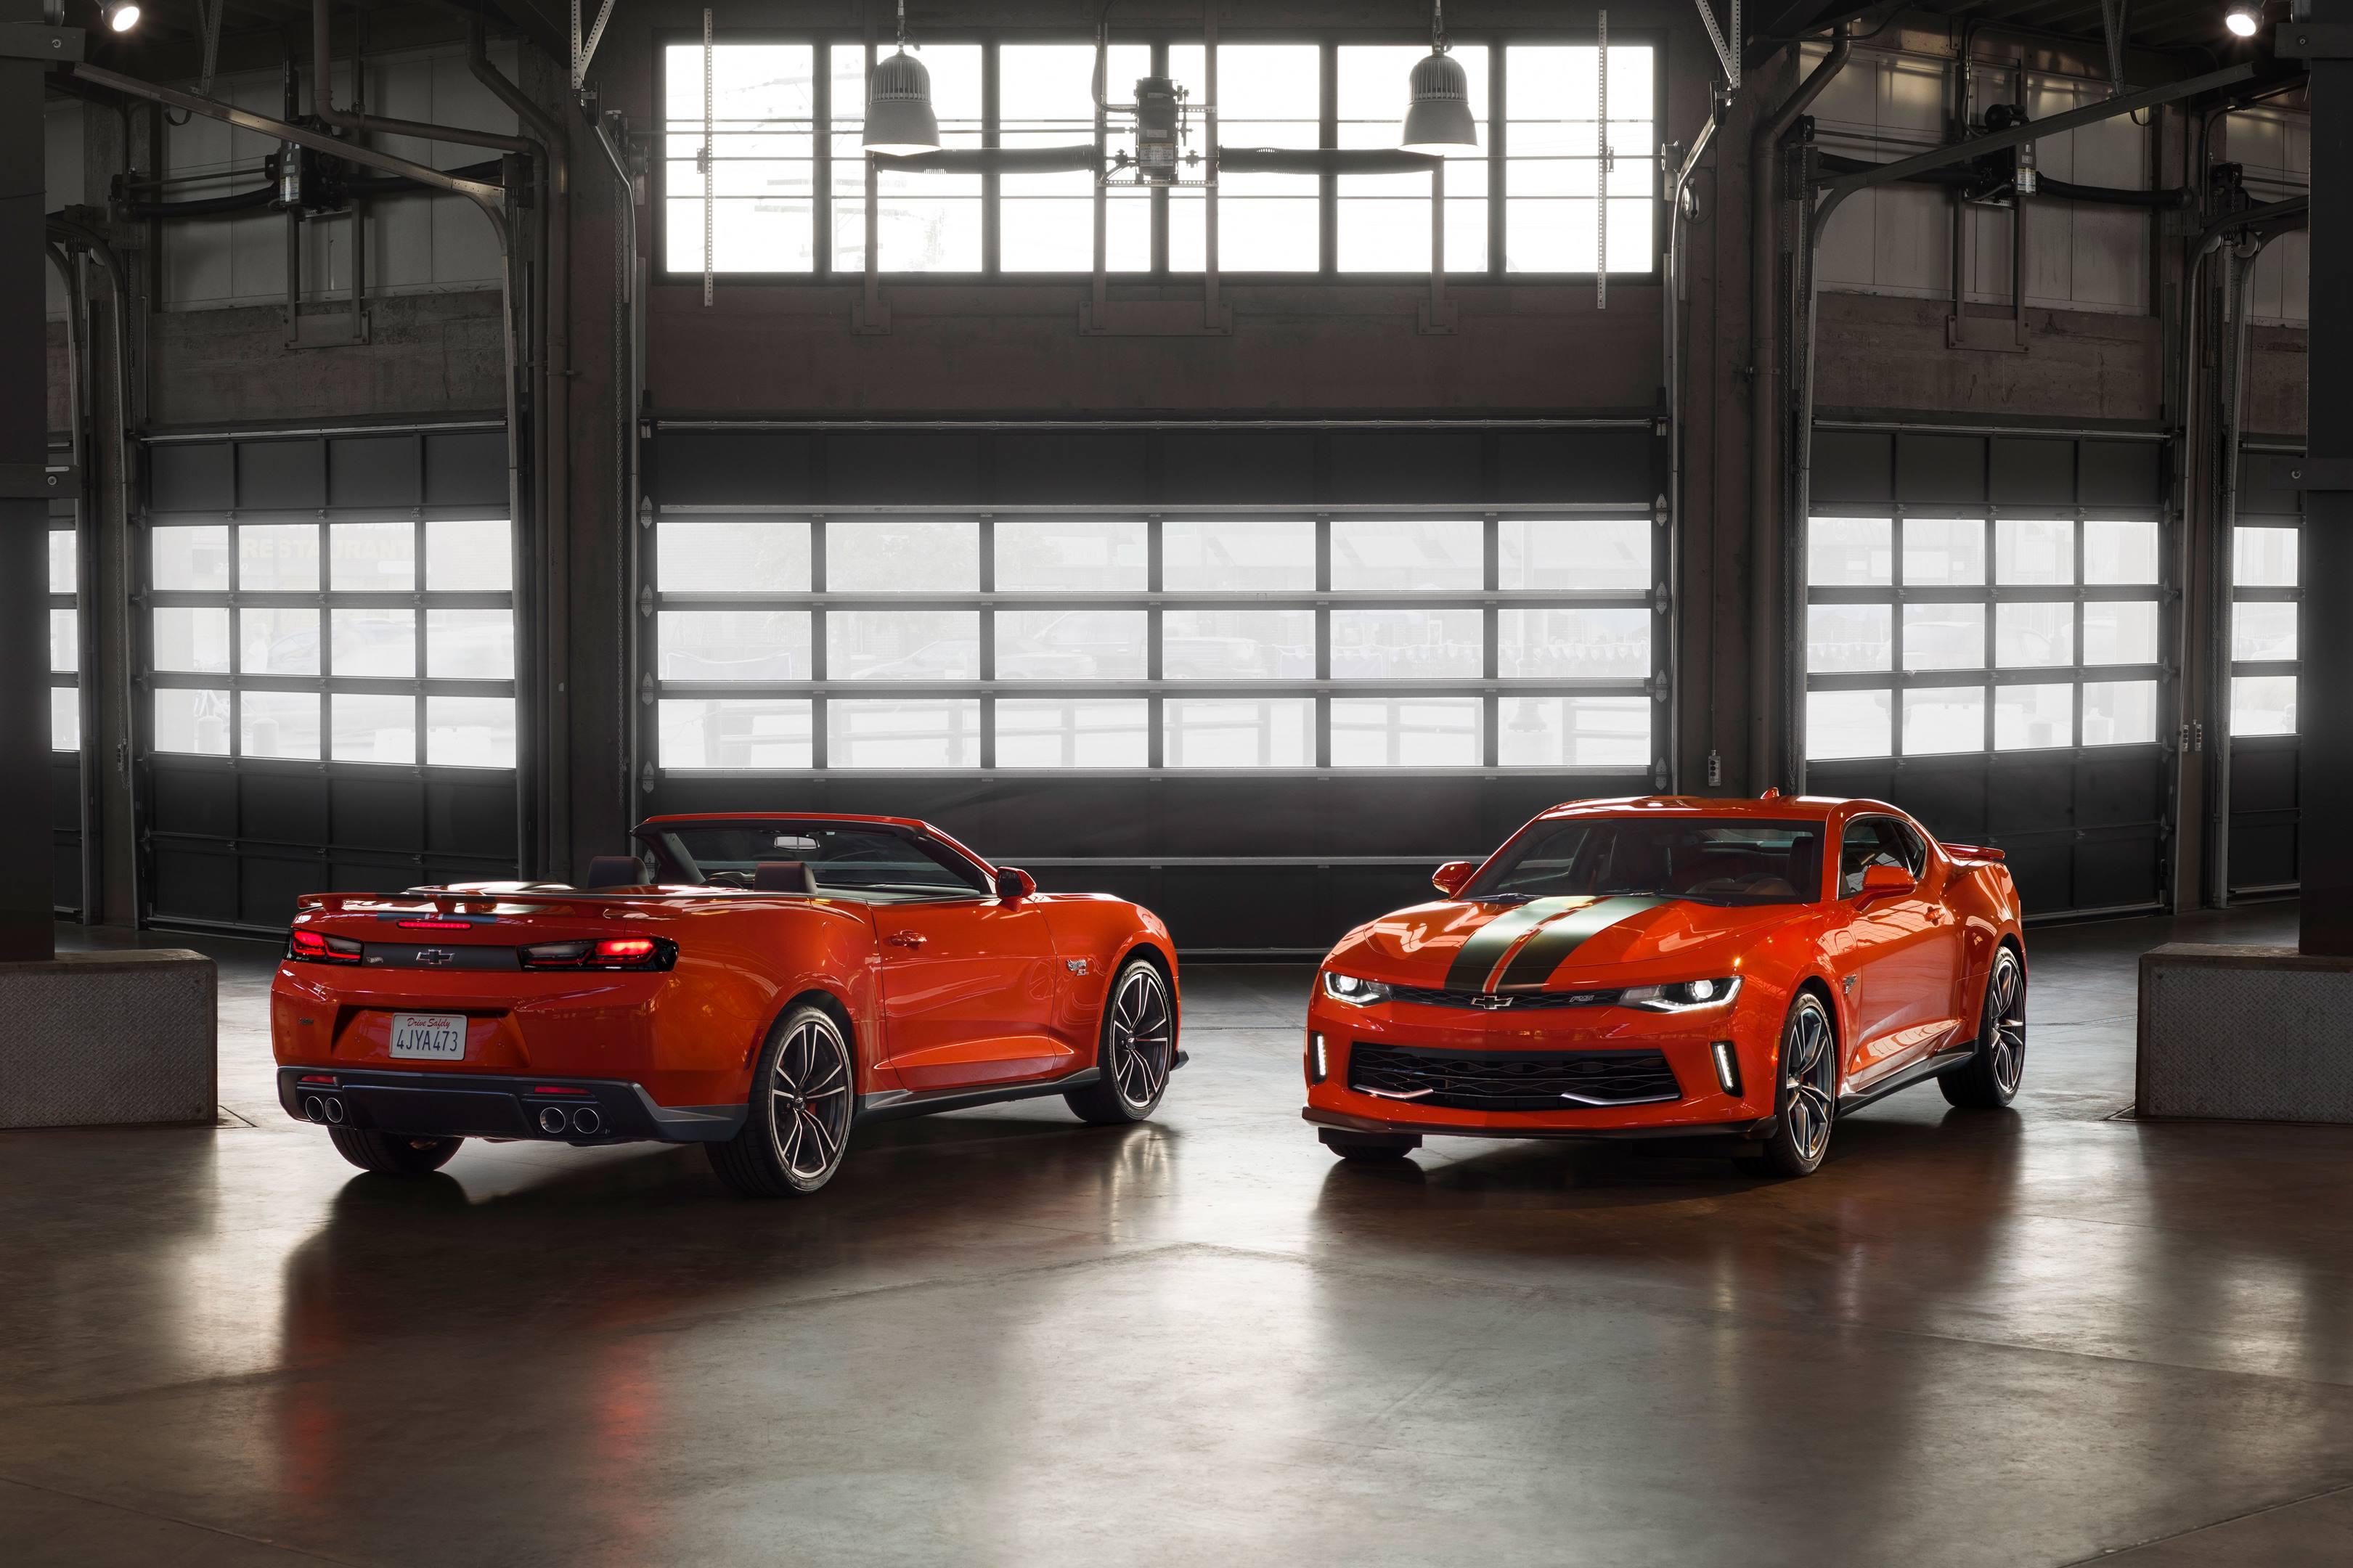 2017 SEMA Chevrolet Hot Wheels Camaro front and back